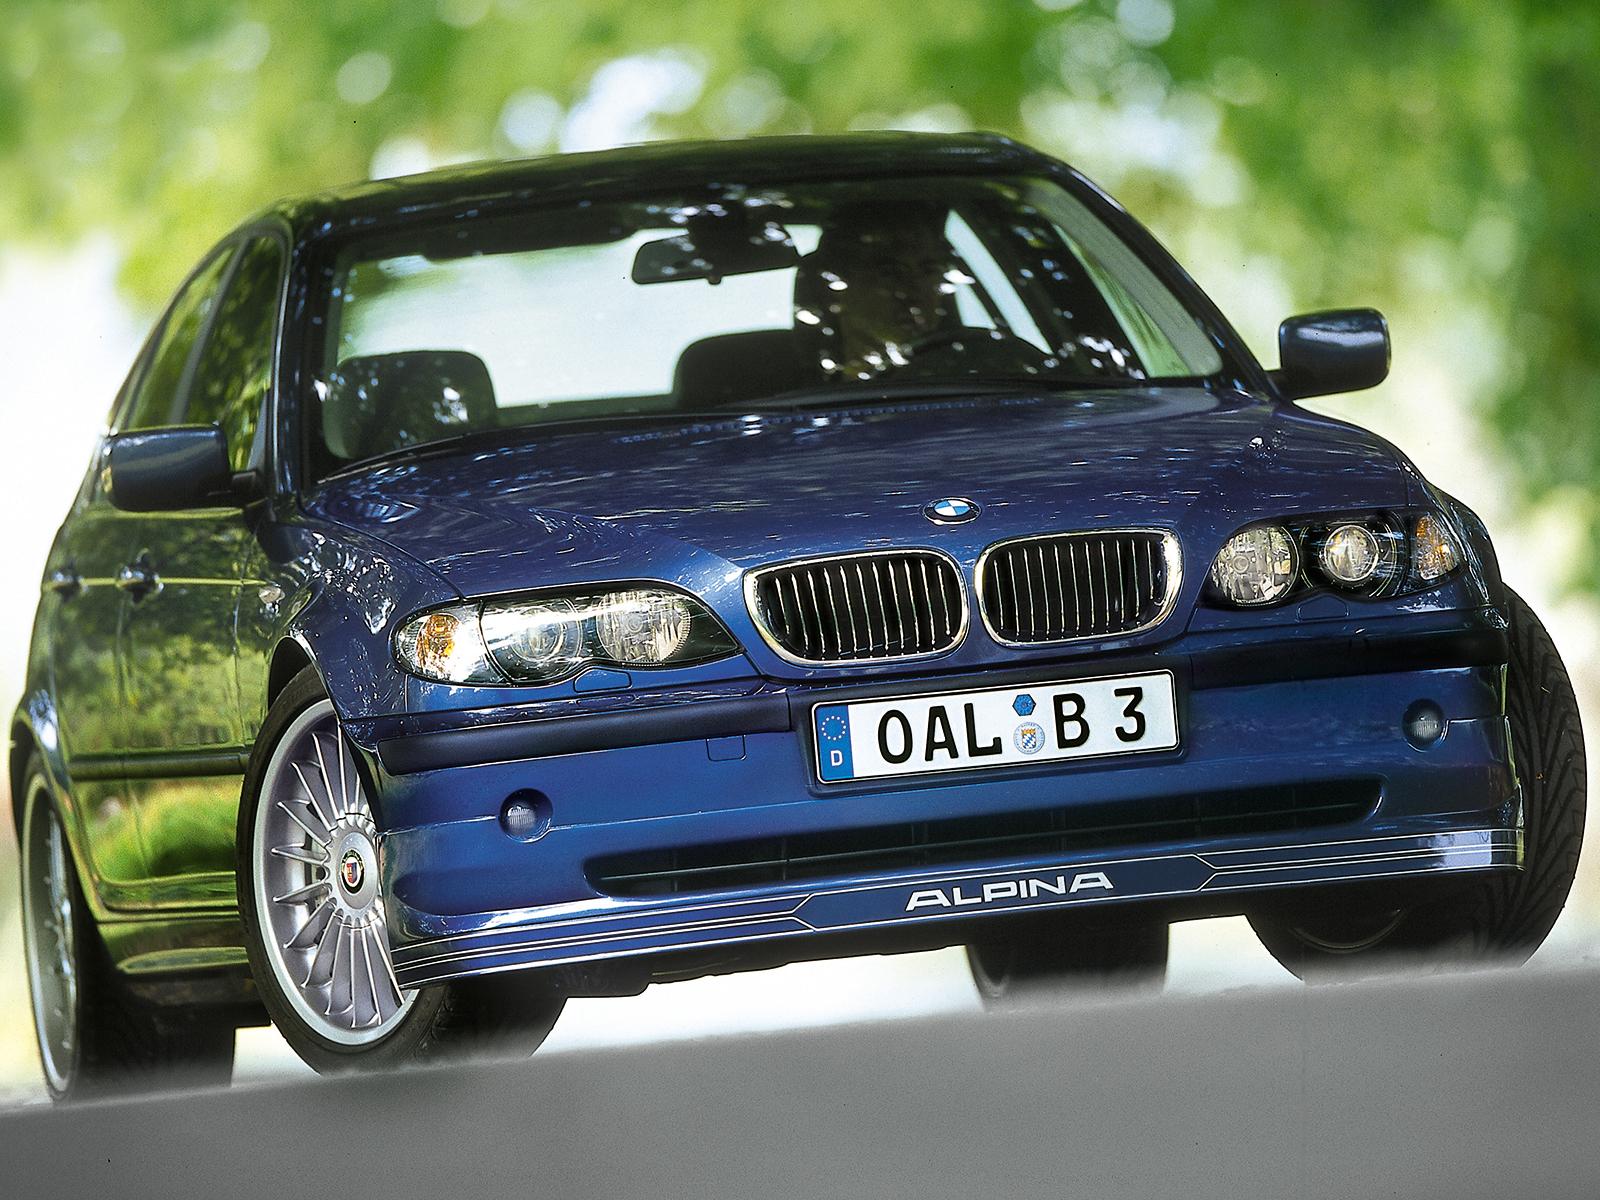 Alpina B3 E46 1999 - 2006 Coupe #3